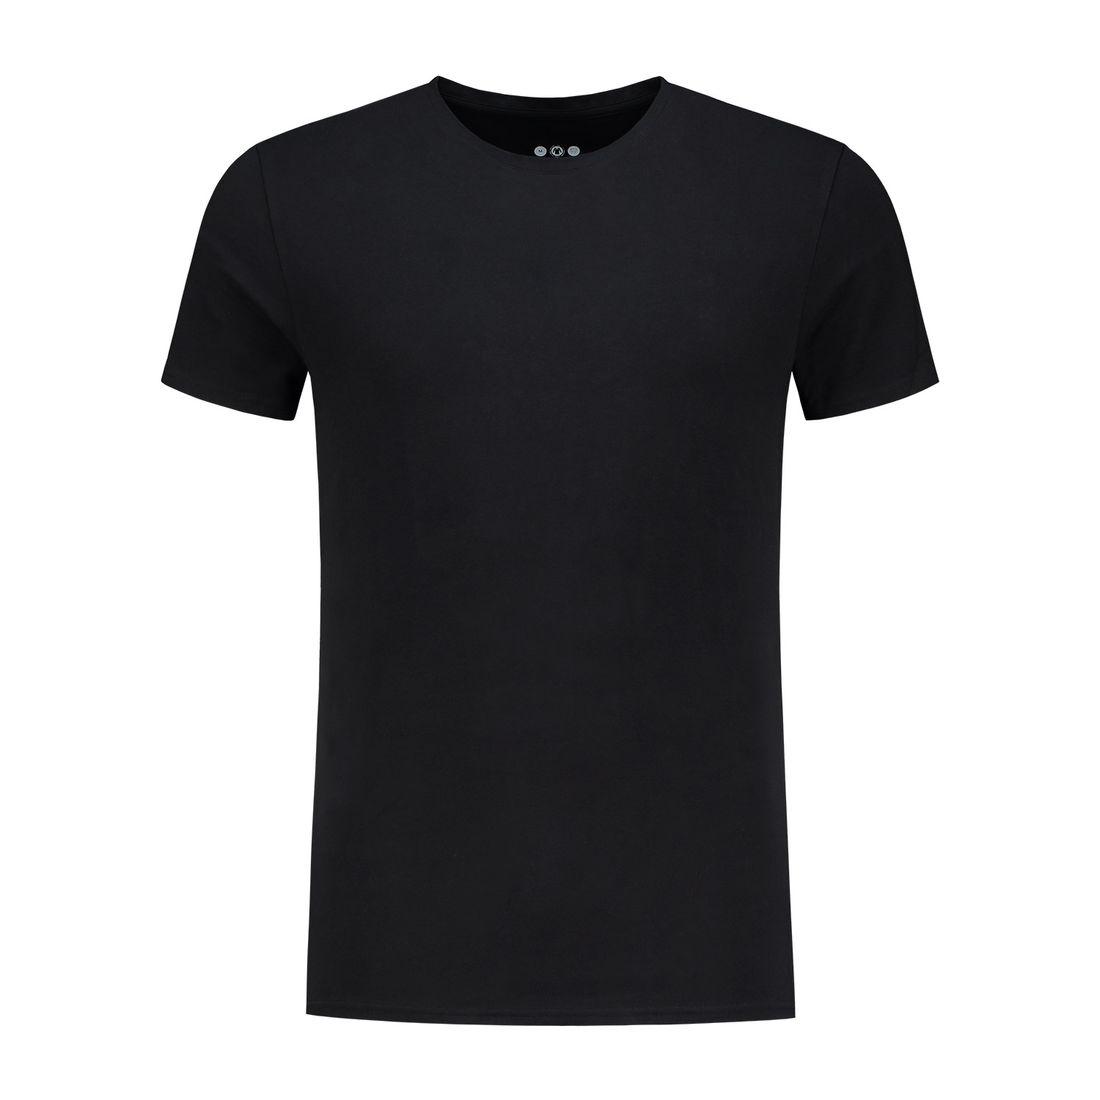 Afbeelding van A dam Underwear otis O hals shirt zwart heren